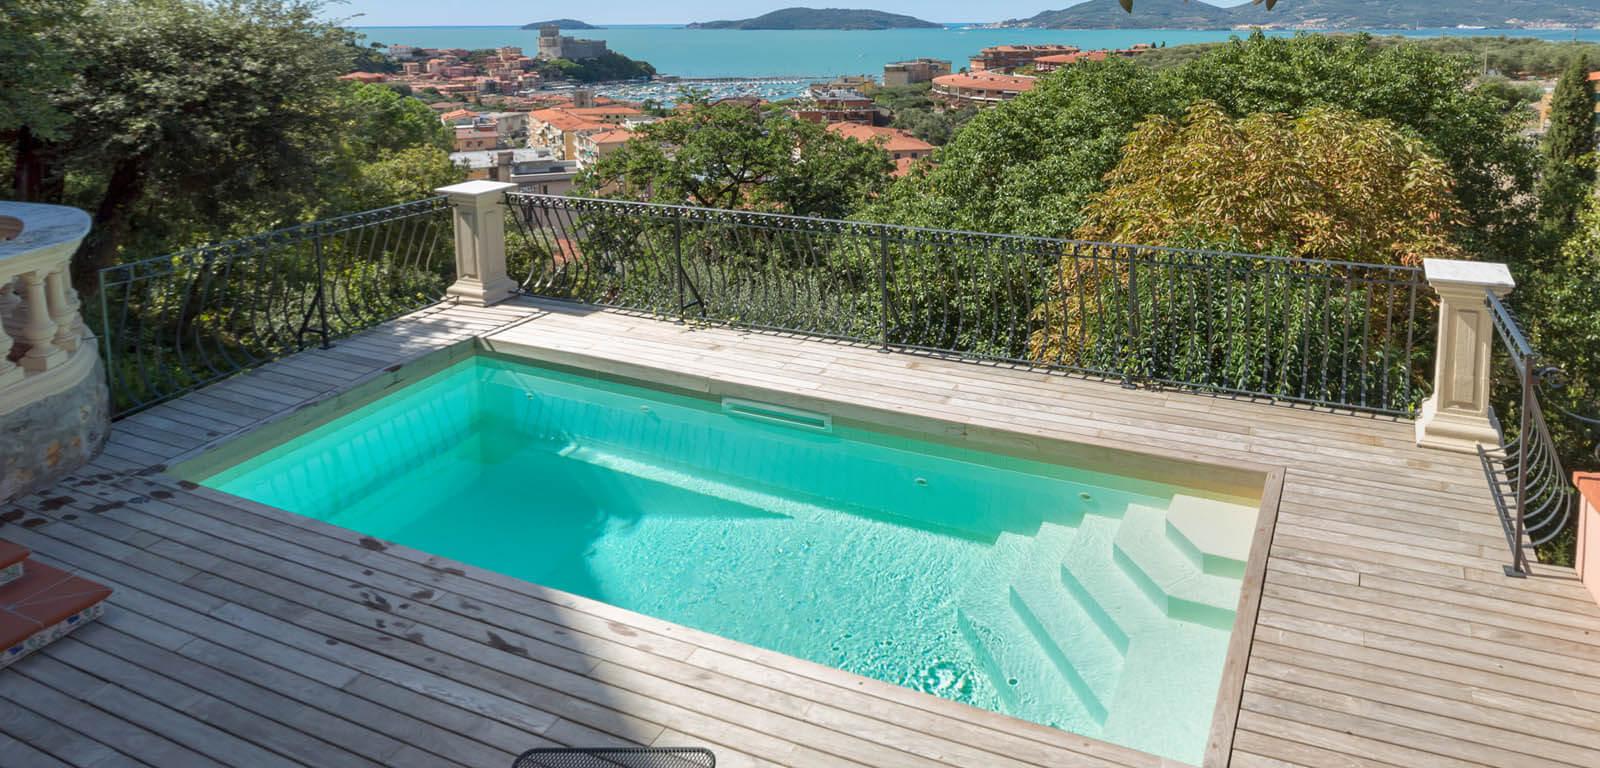 7 tipi di piscina per case con poco spazio blog volpes case for Piscina in giardino